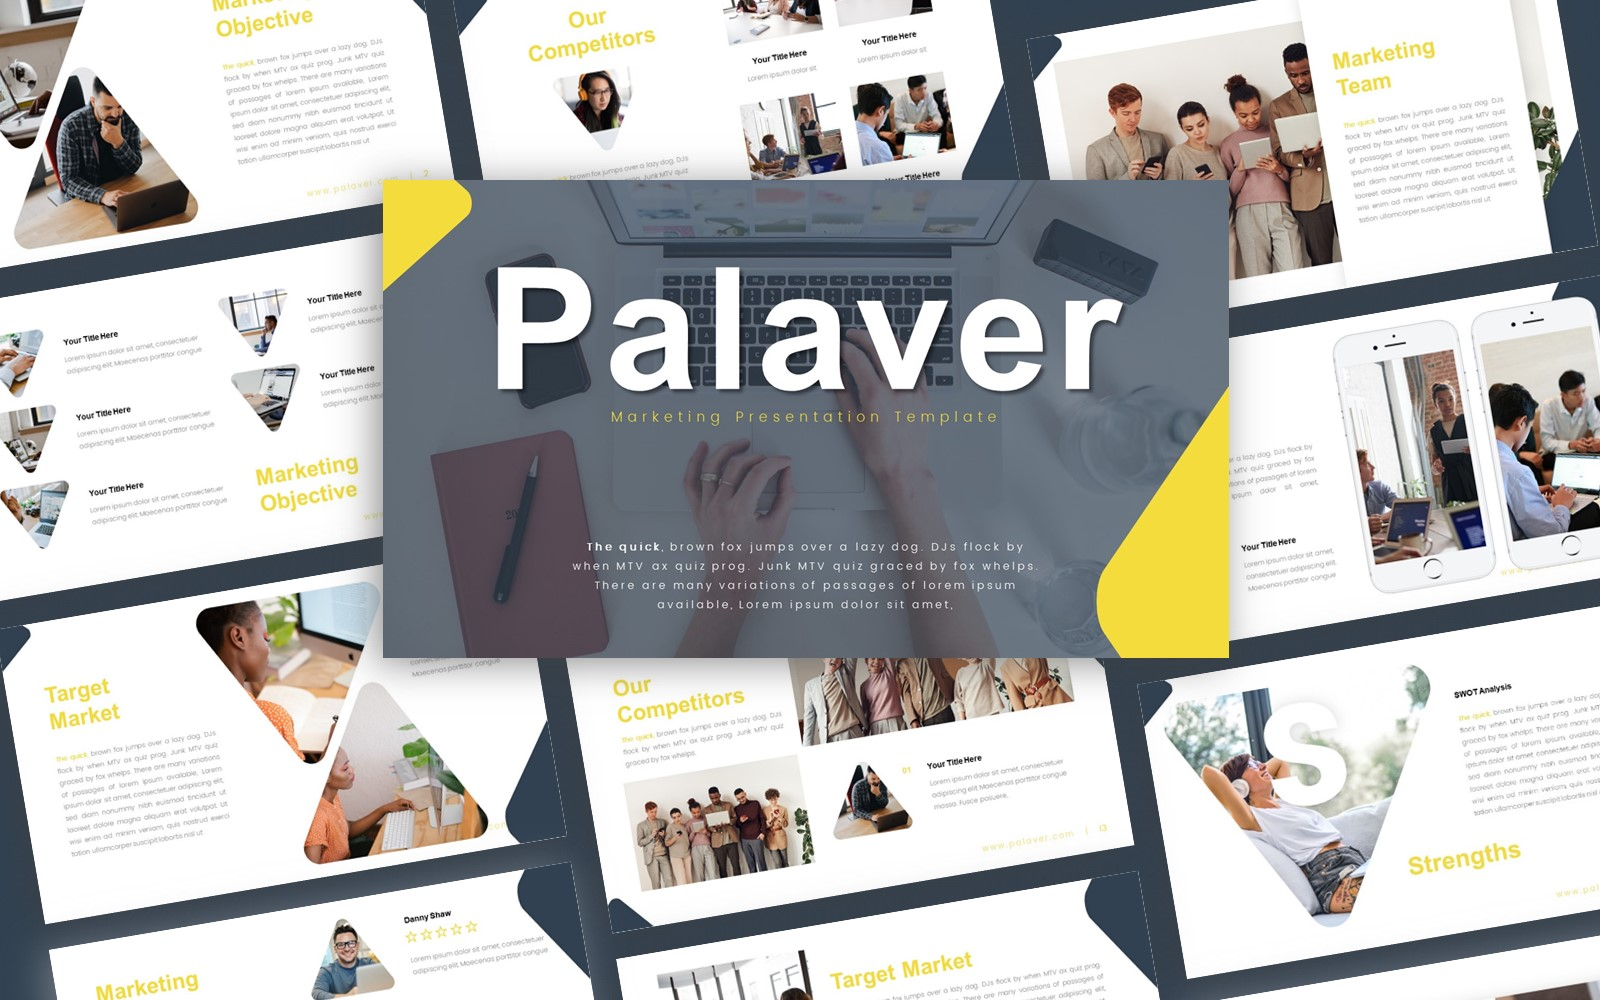 Palaver Marketing Presentation PowerPoint Template